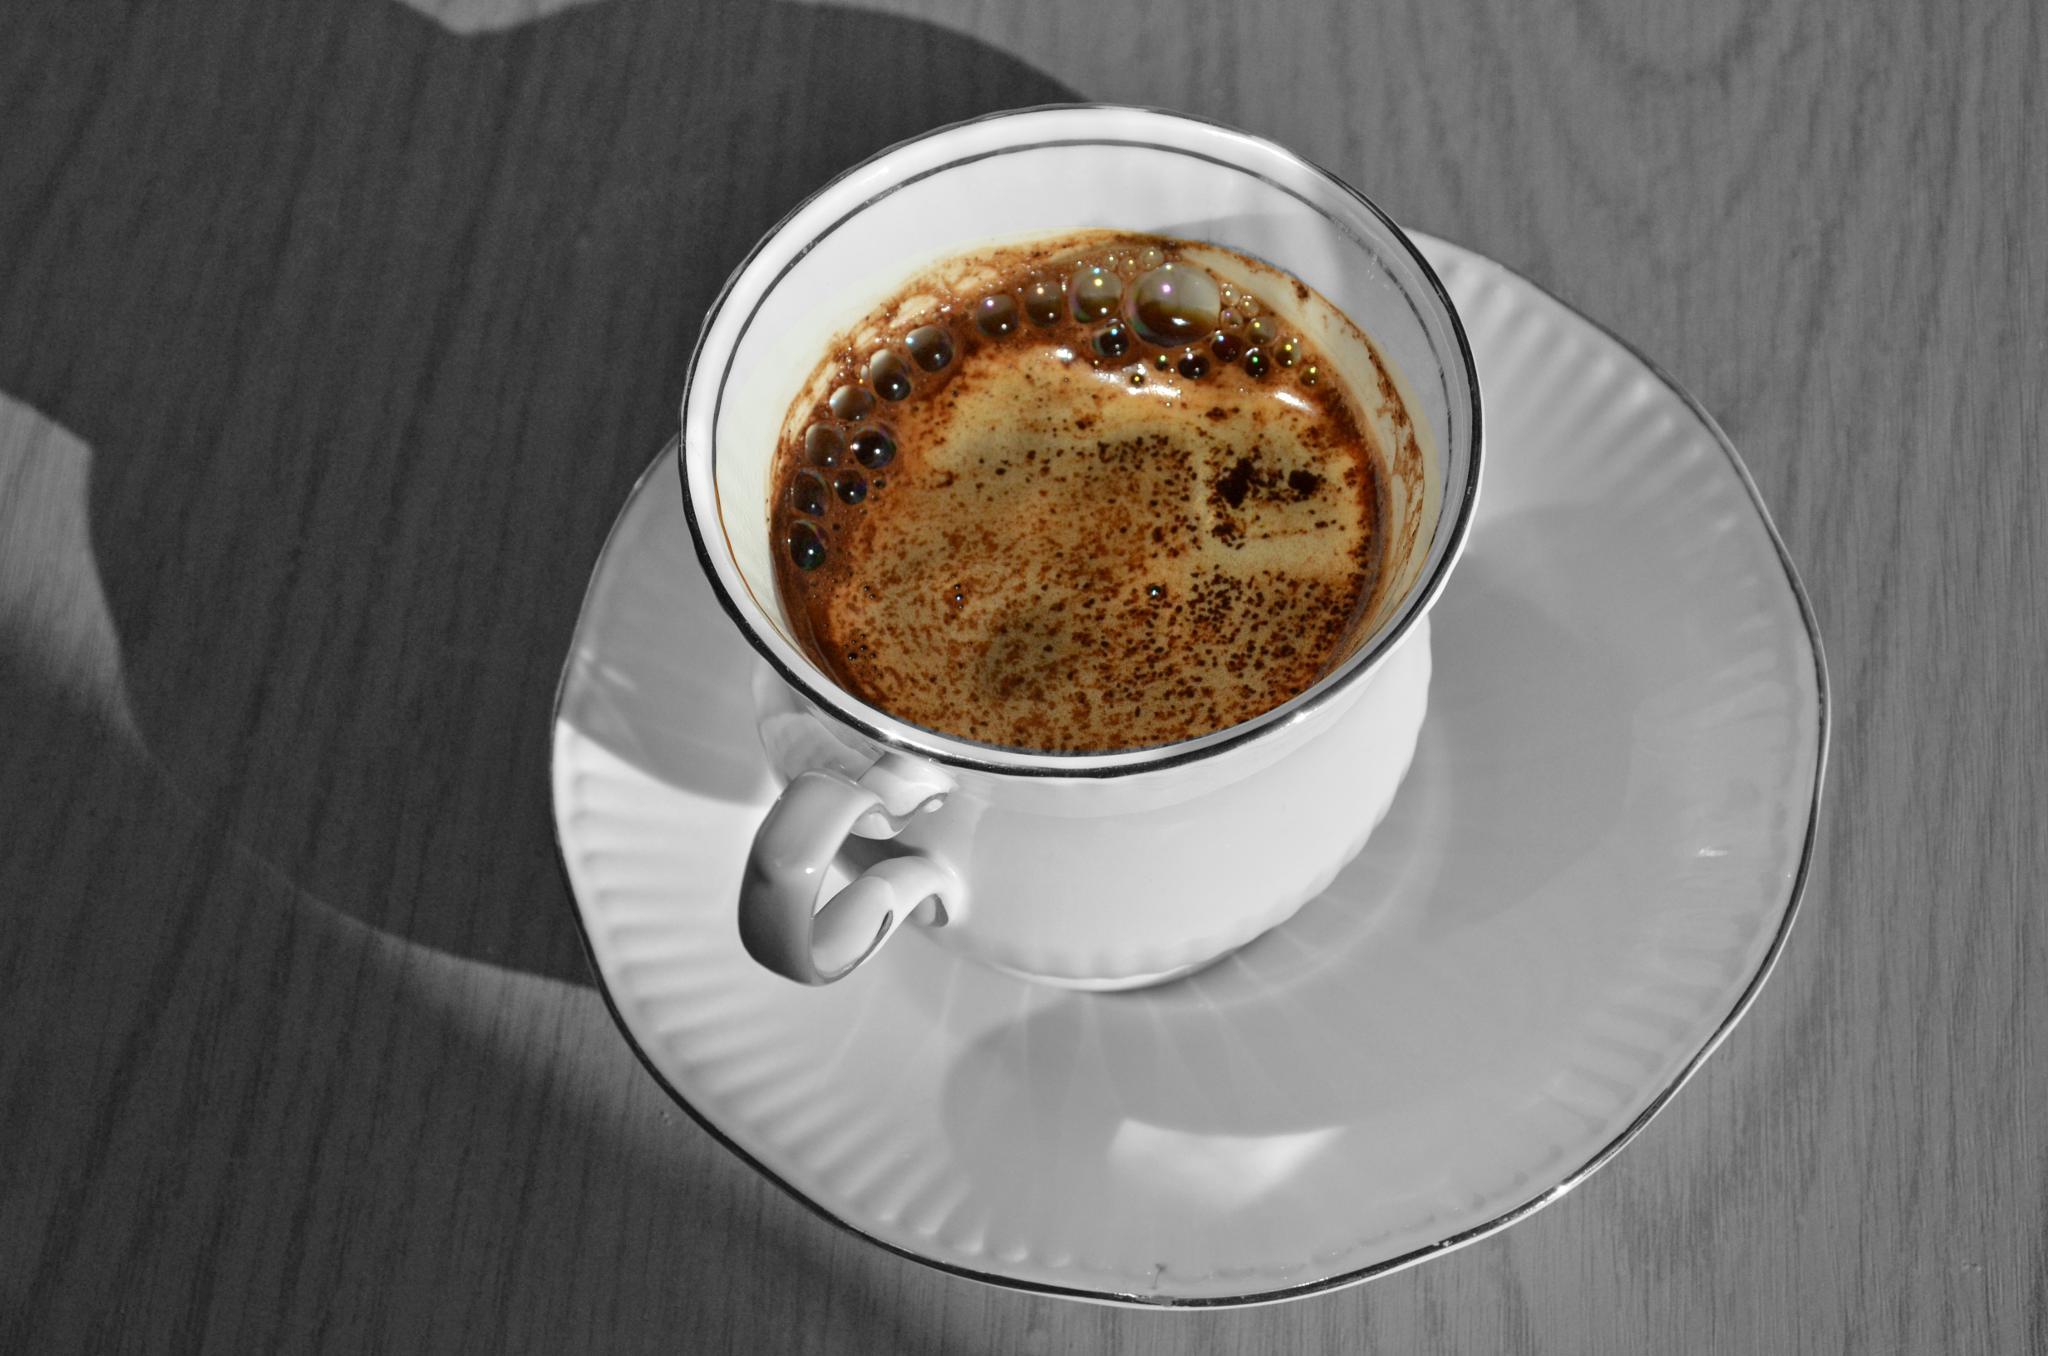 Coffee by Zenonas Meškauskas